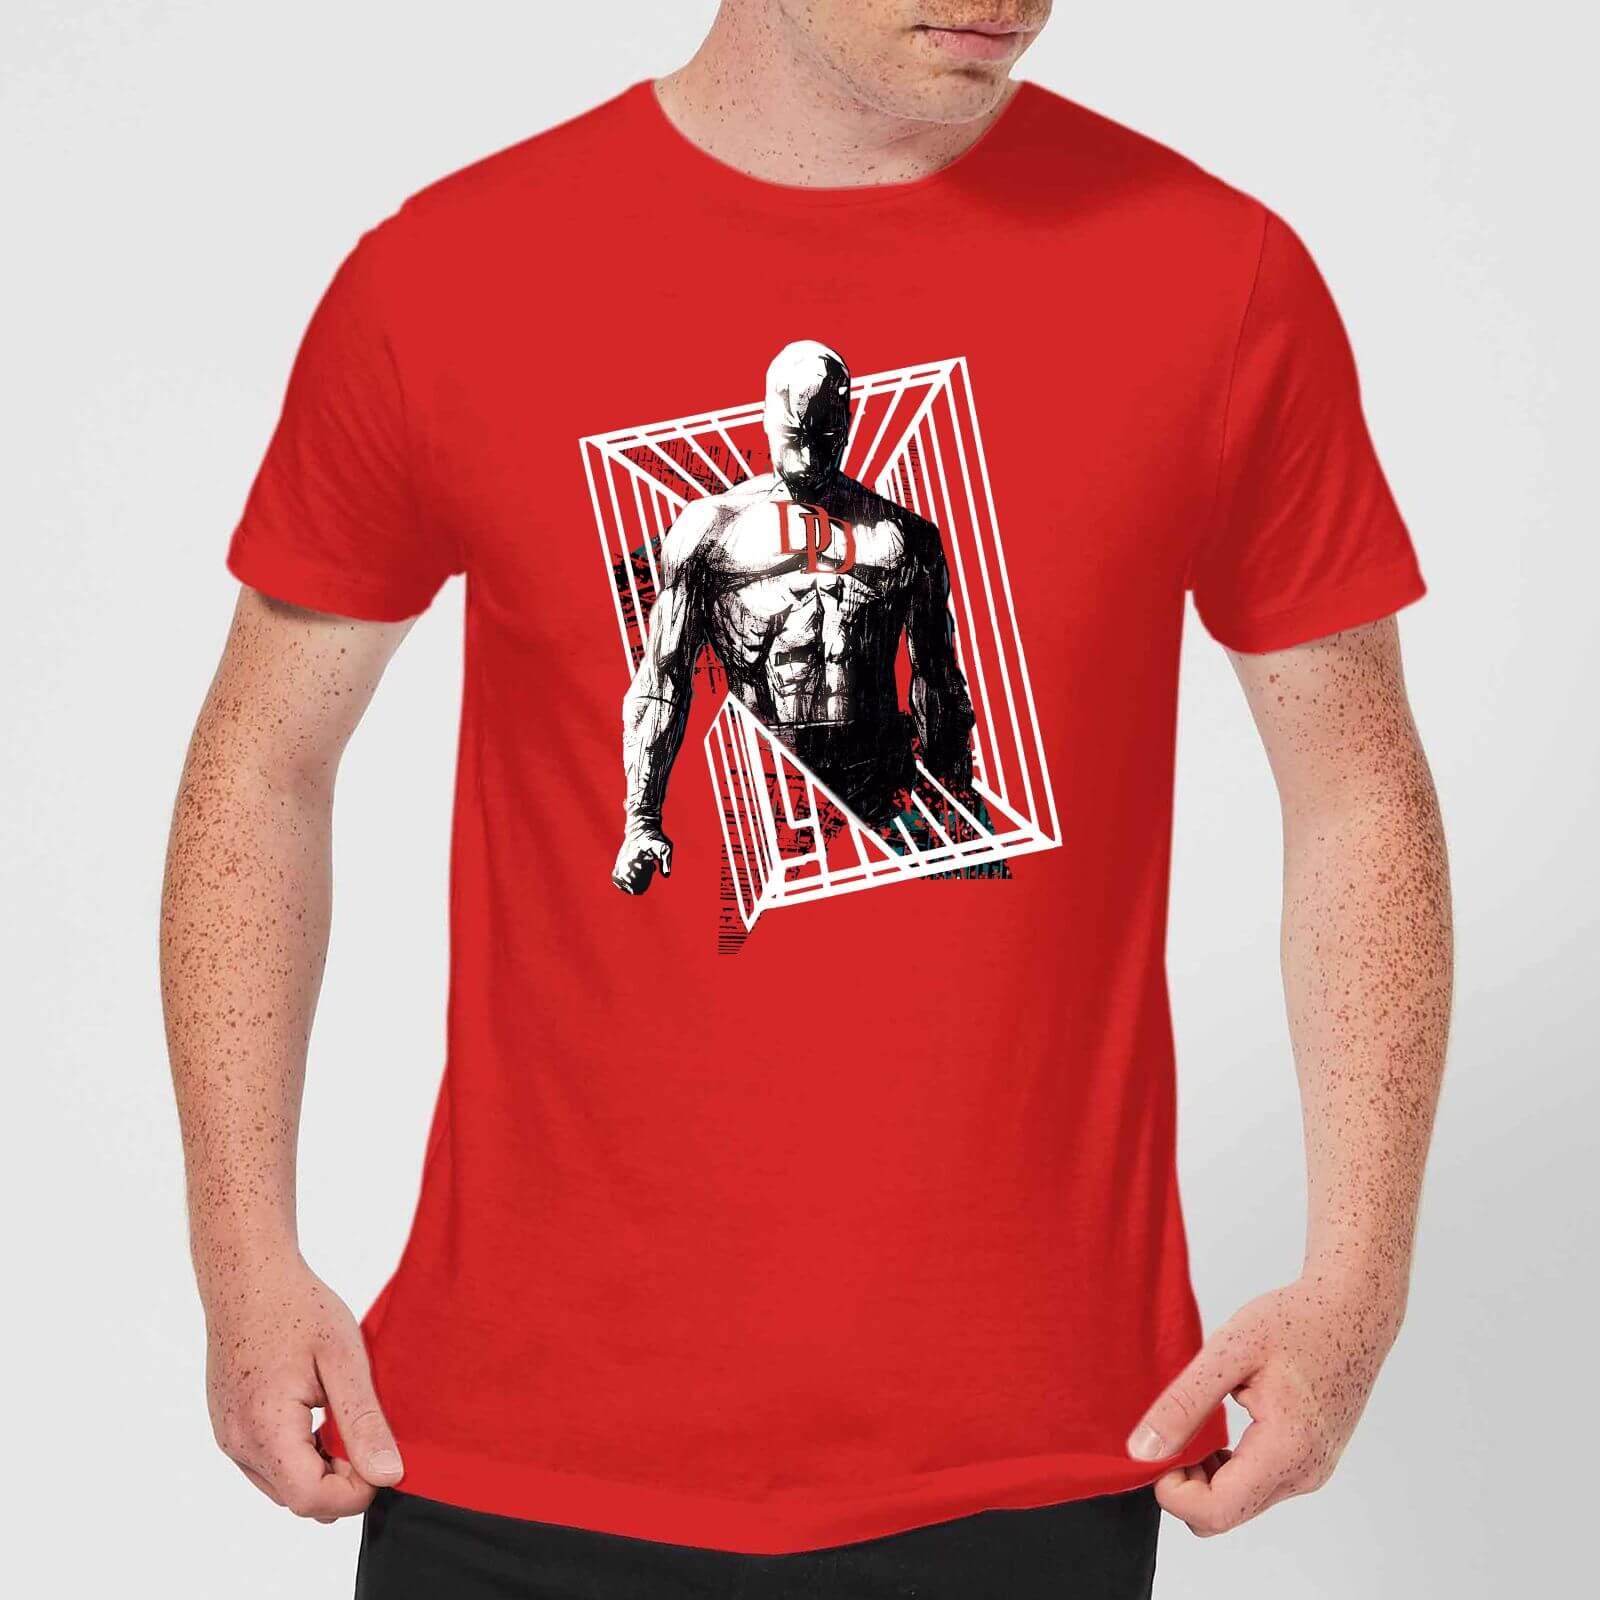 OfferteWeb.click 15-t-shirt-marvel-knights-daredevil-cage-rosso-uomo-s